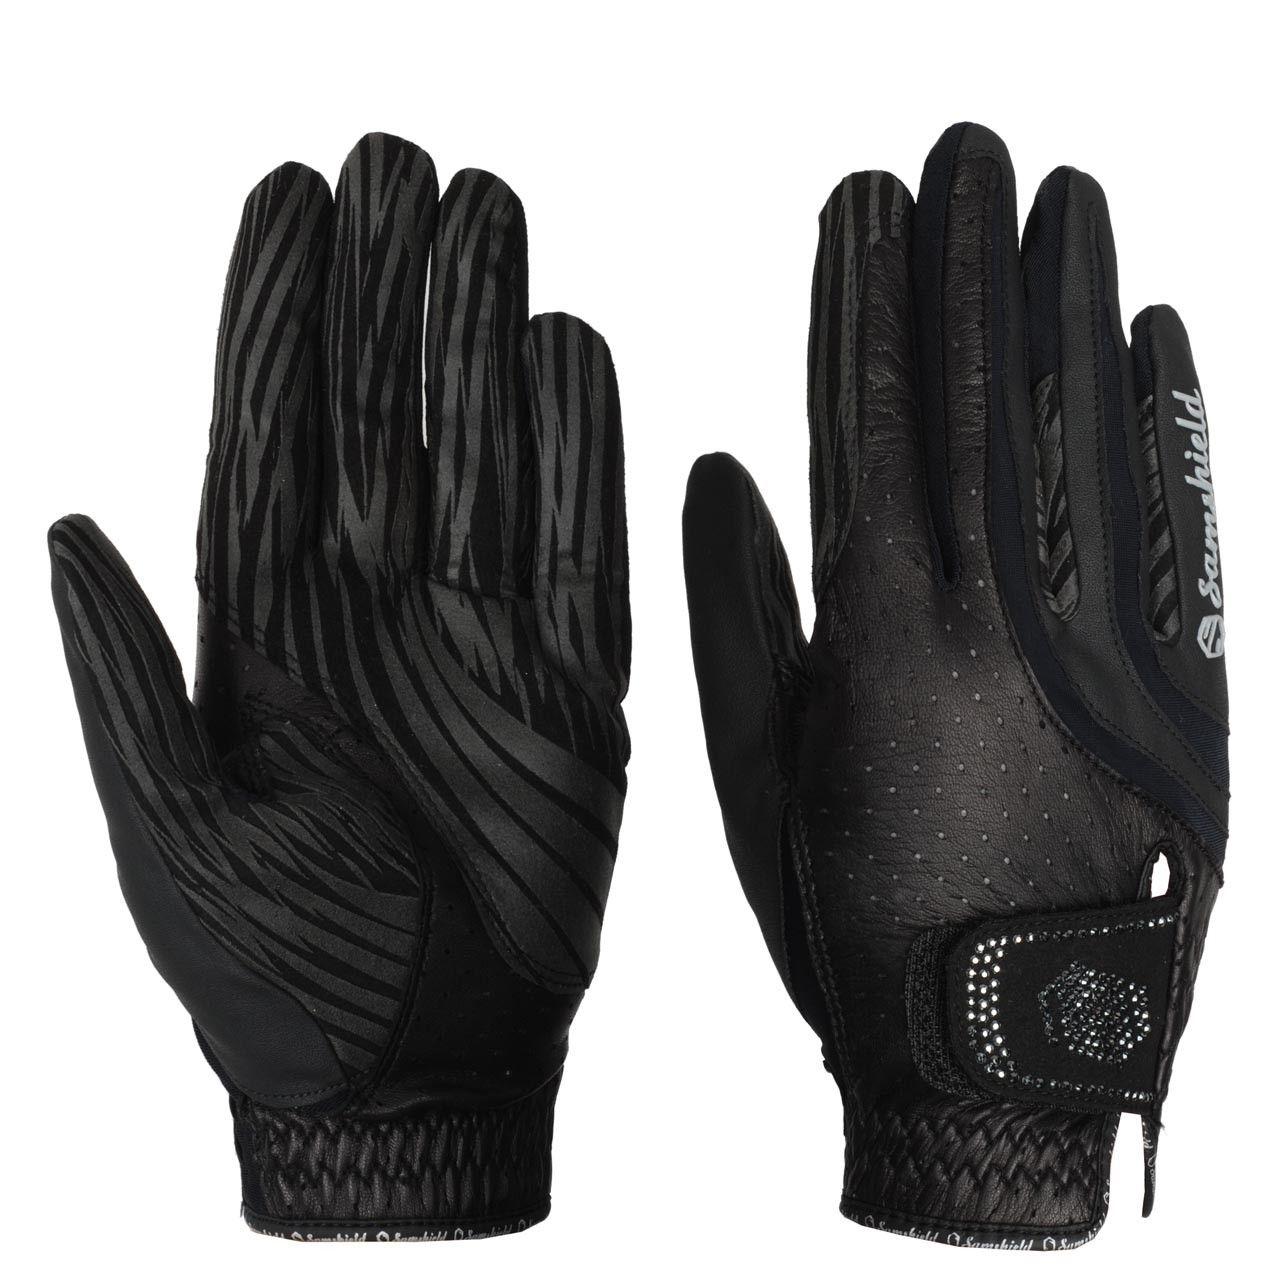 Samshield handschoenen Swarovski zwart maat:8,5